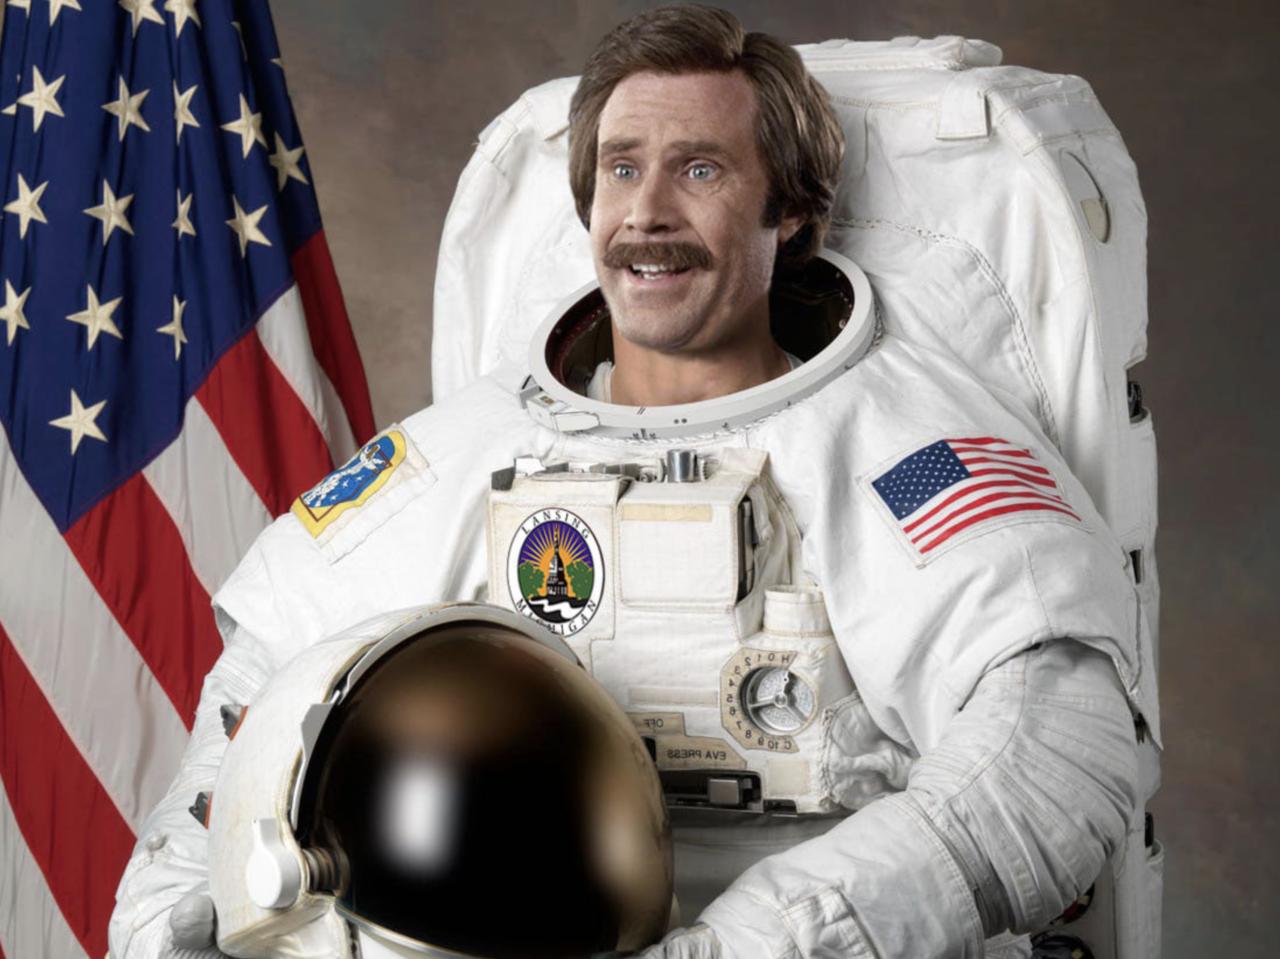 Ron Burgandy promises more space exploration